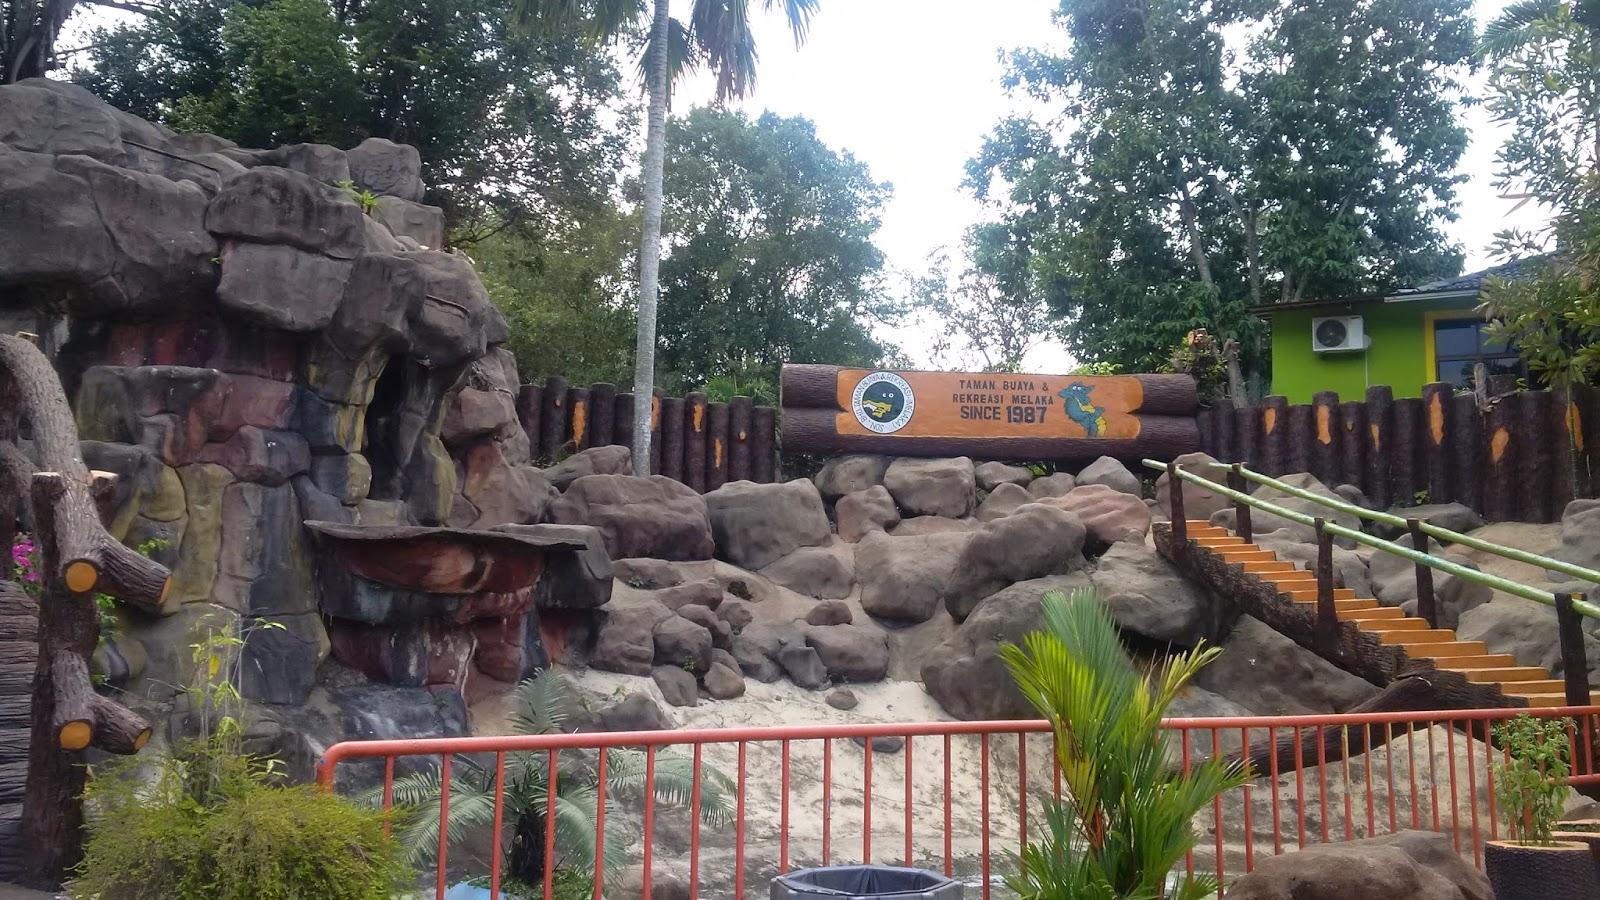 taman buaya melaka, crocodile farm melaka, tourism, travel, reptile house, melaka attractions, water park playground